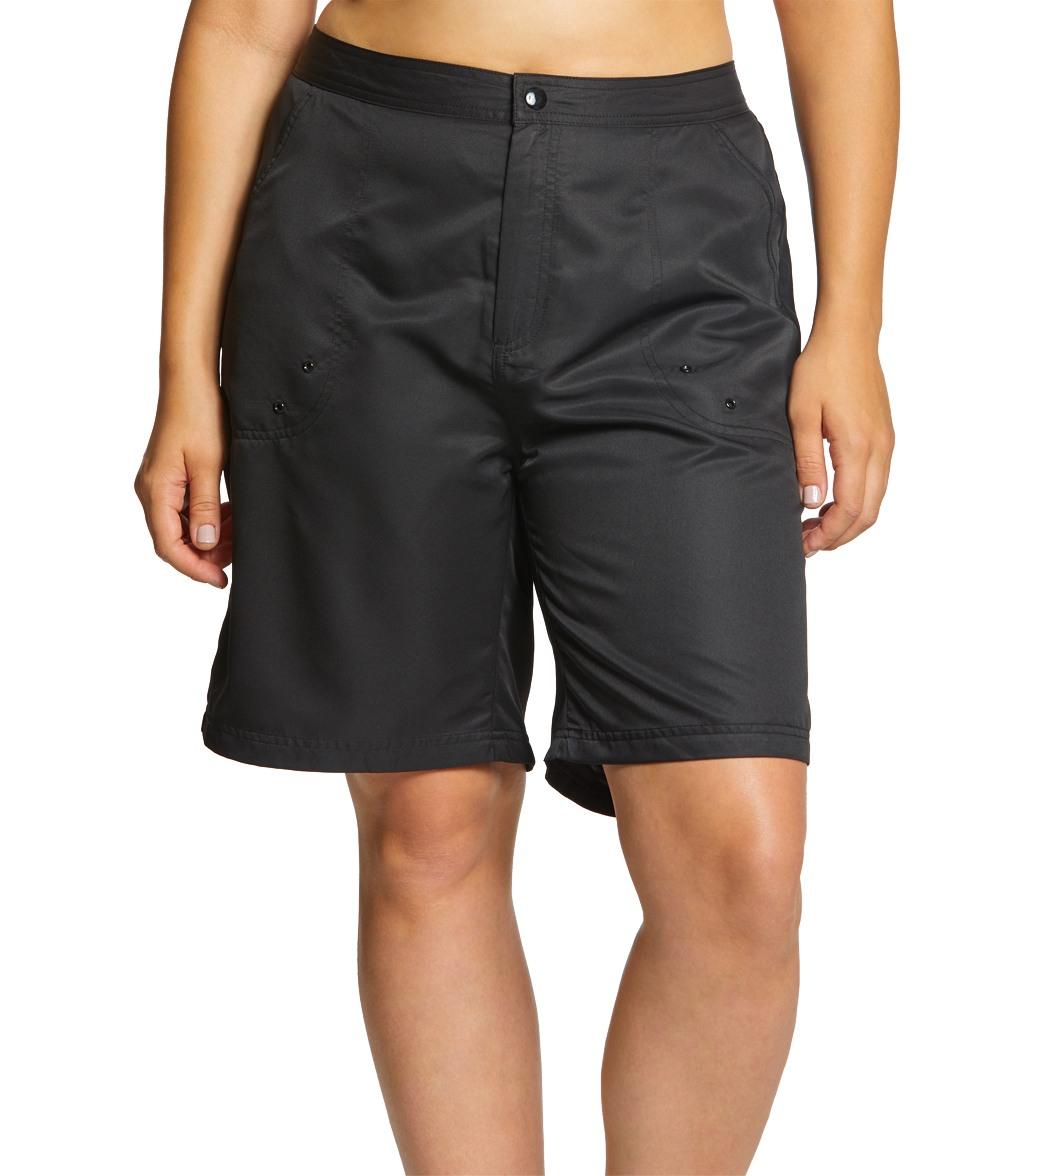 58e50ec05e Sporti Women's Plus Size Solid Woven Long Board Short